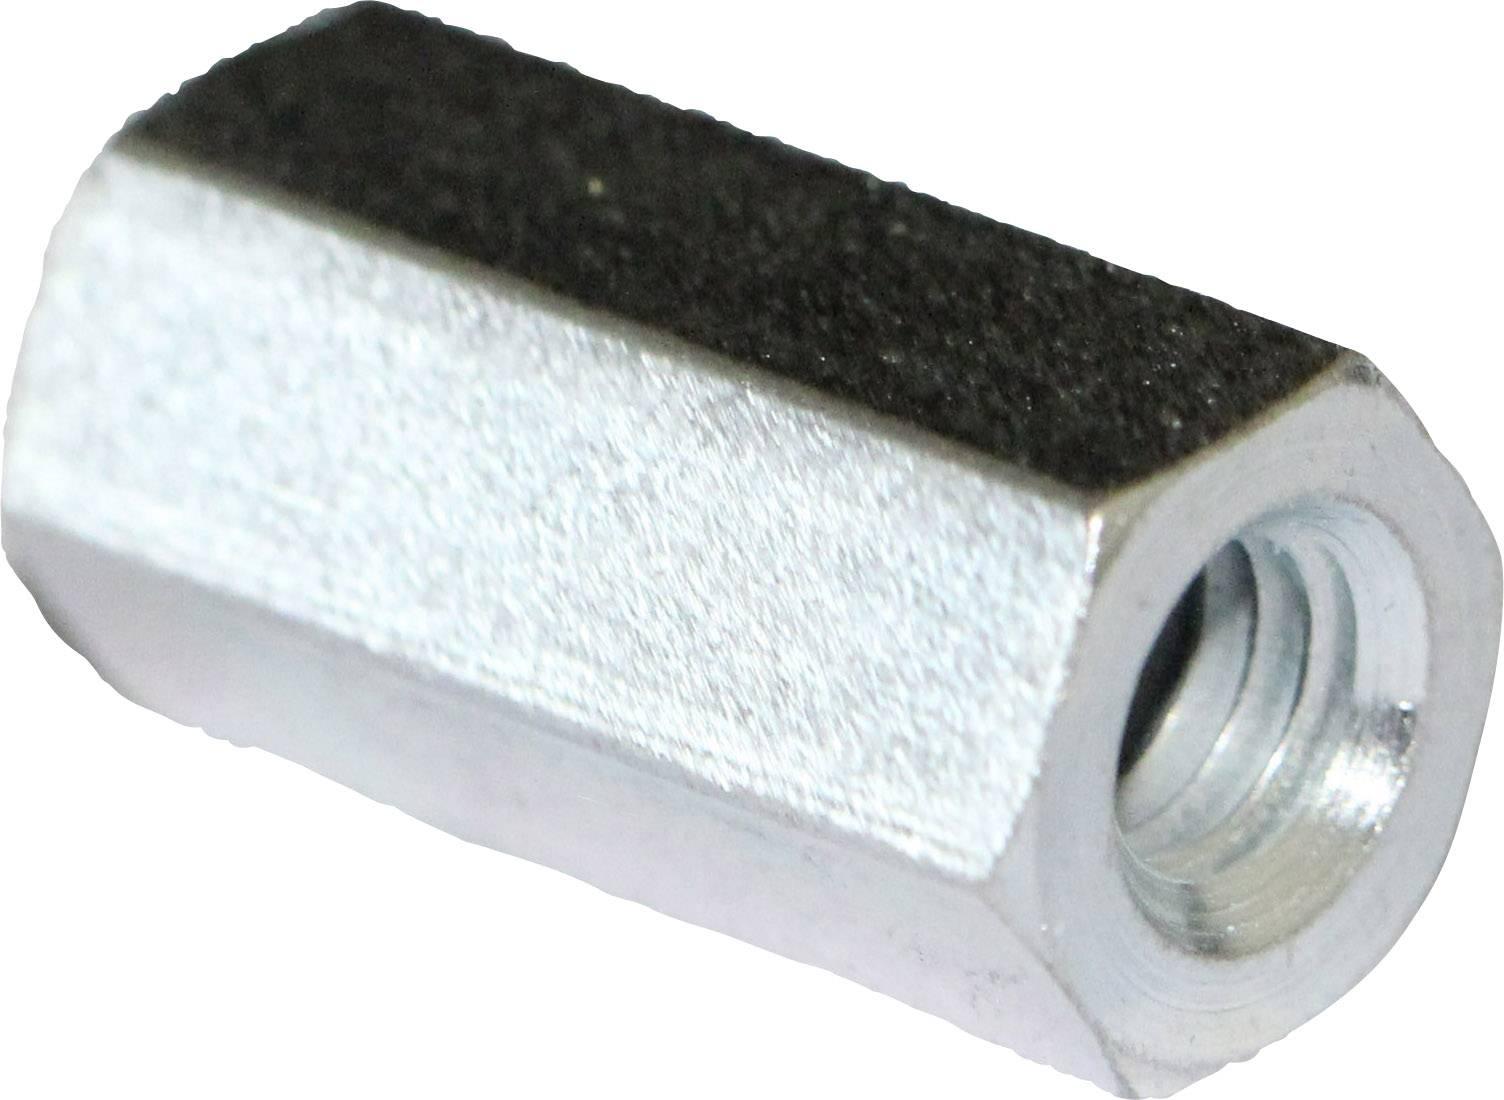 Distanční sloupek PB Fastener S55530X05, M3 x 5 mm, 10 ks